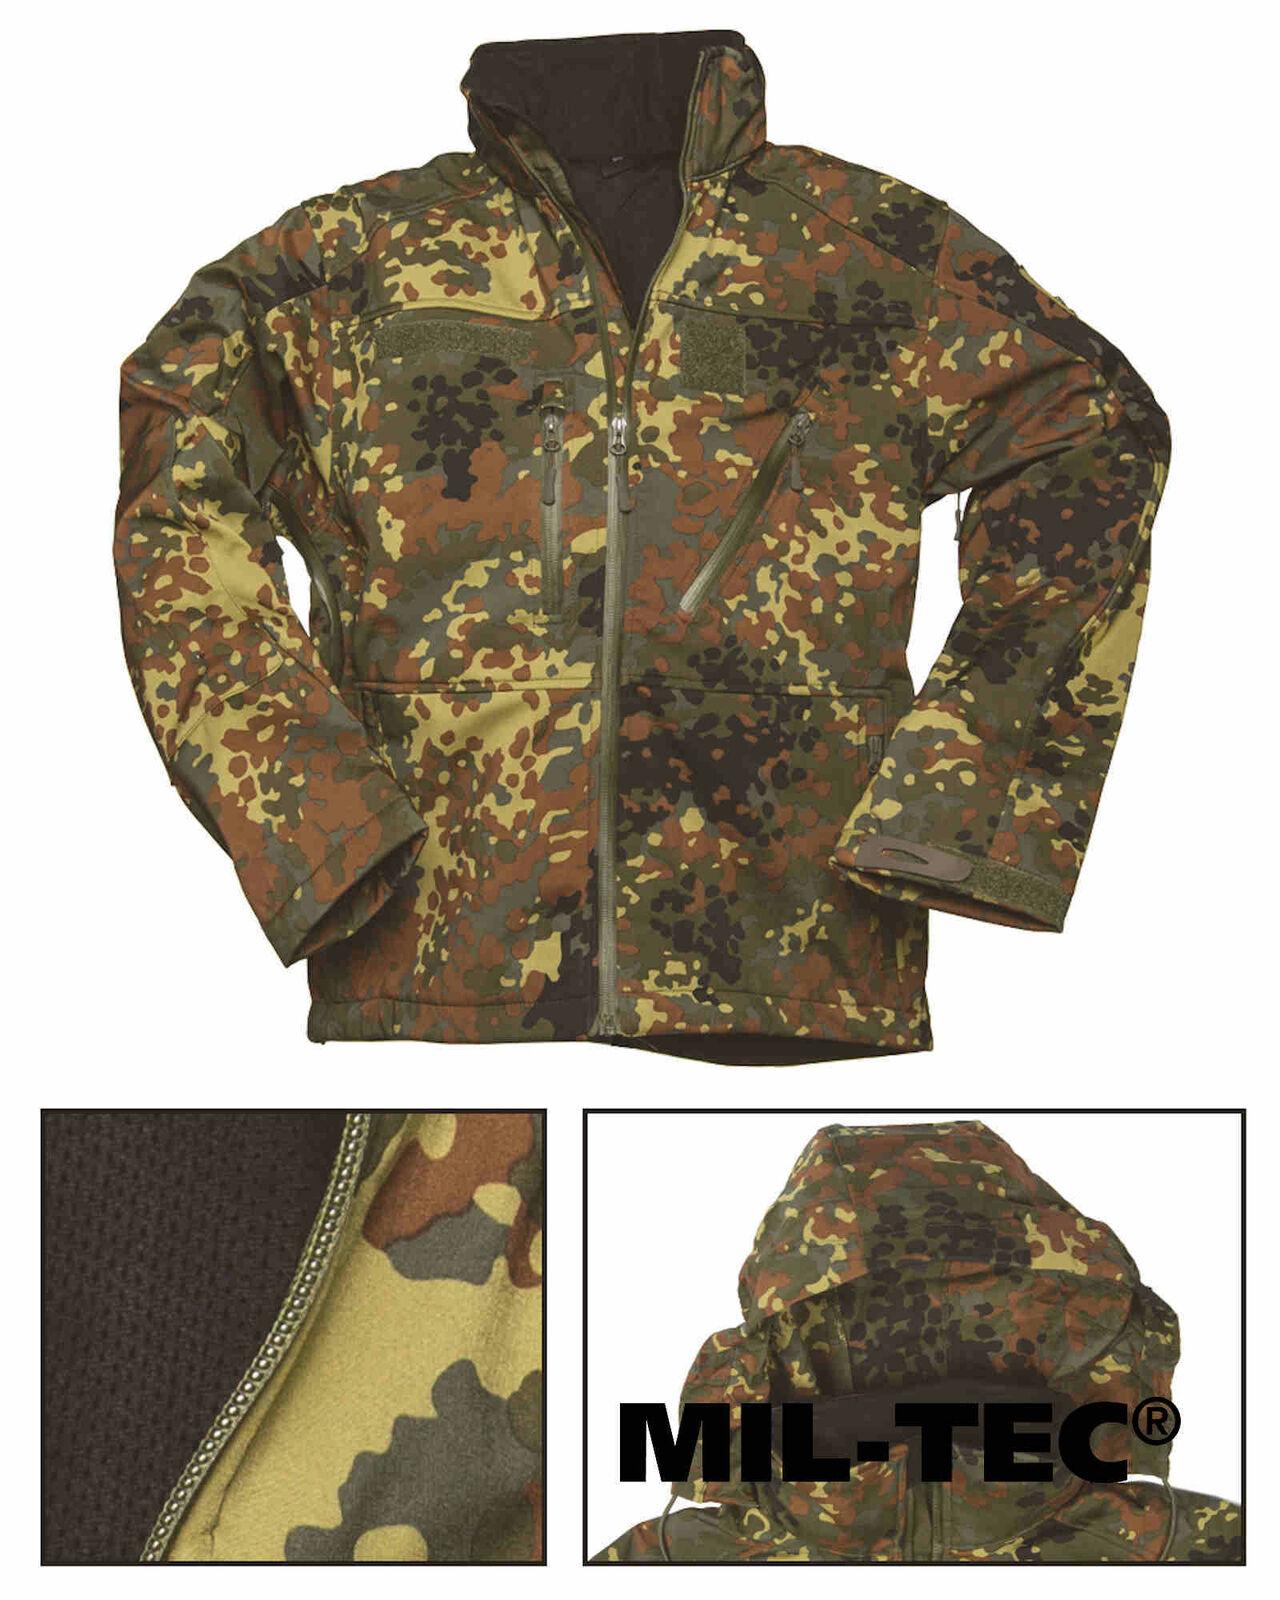 Mil-Tec TACTICAL HEMD WARRIOR SCHWARZ Outdoorjacke Jacke